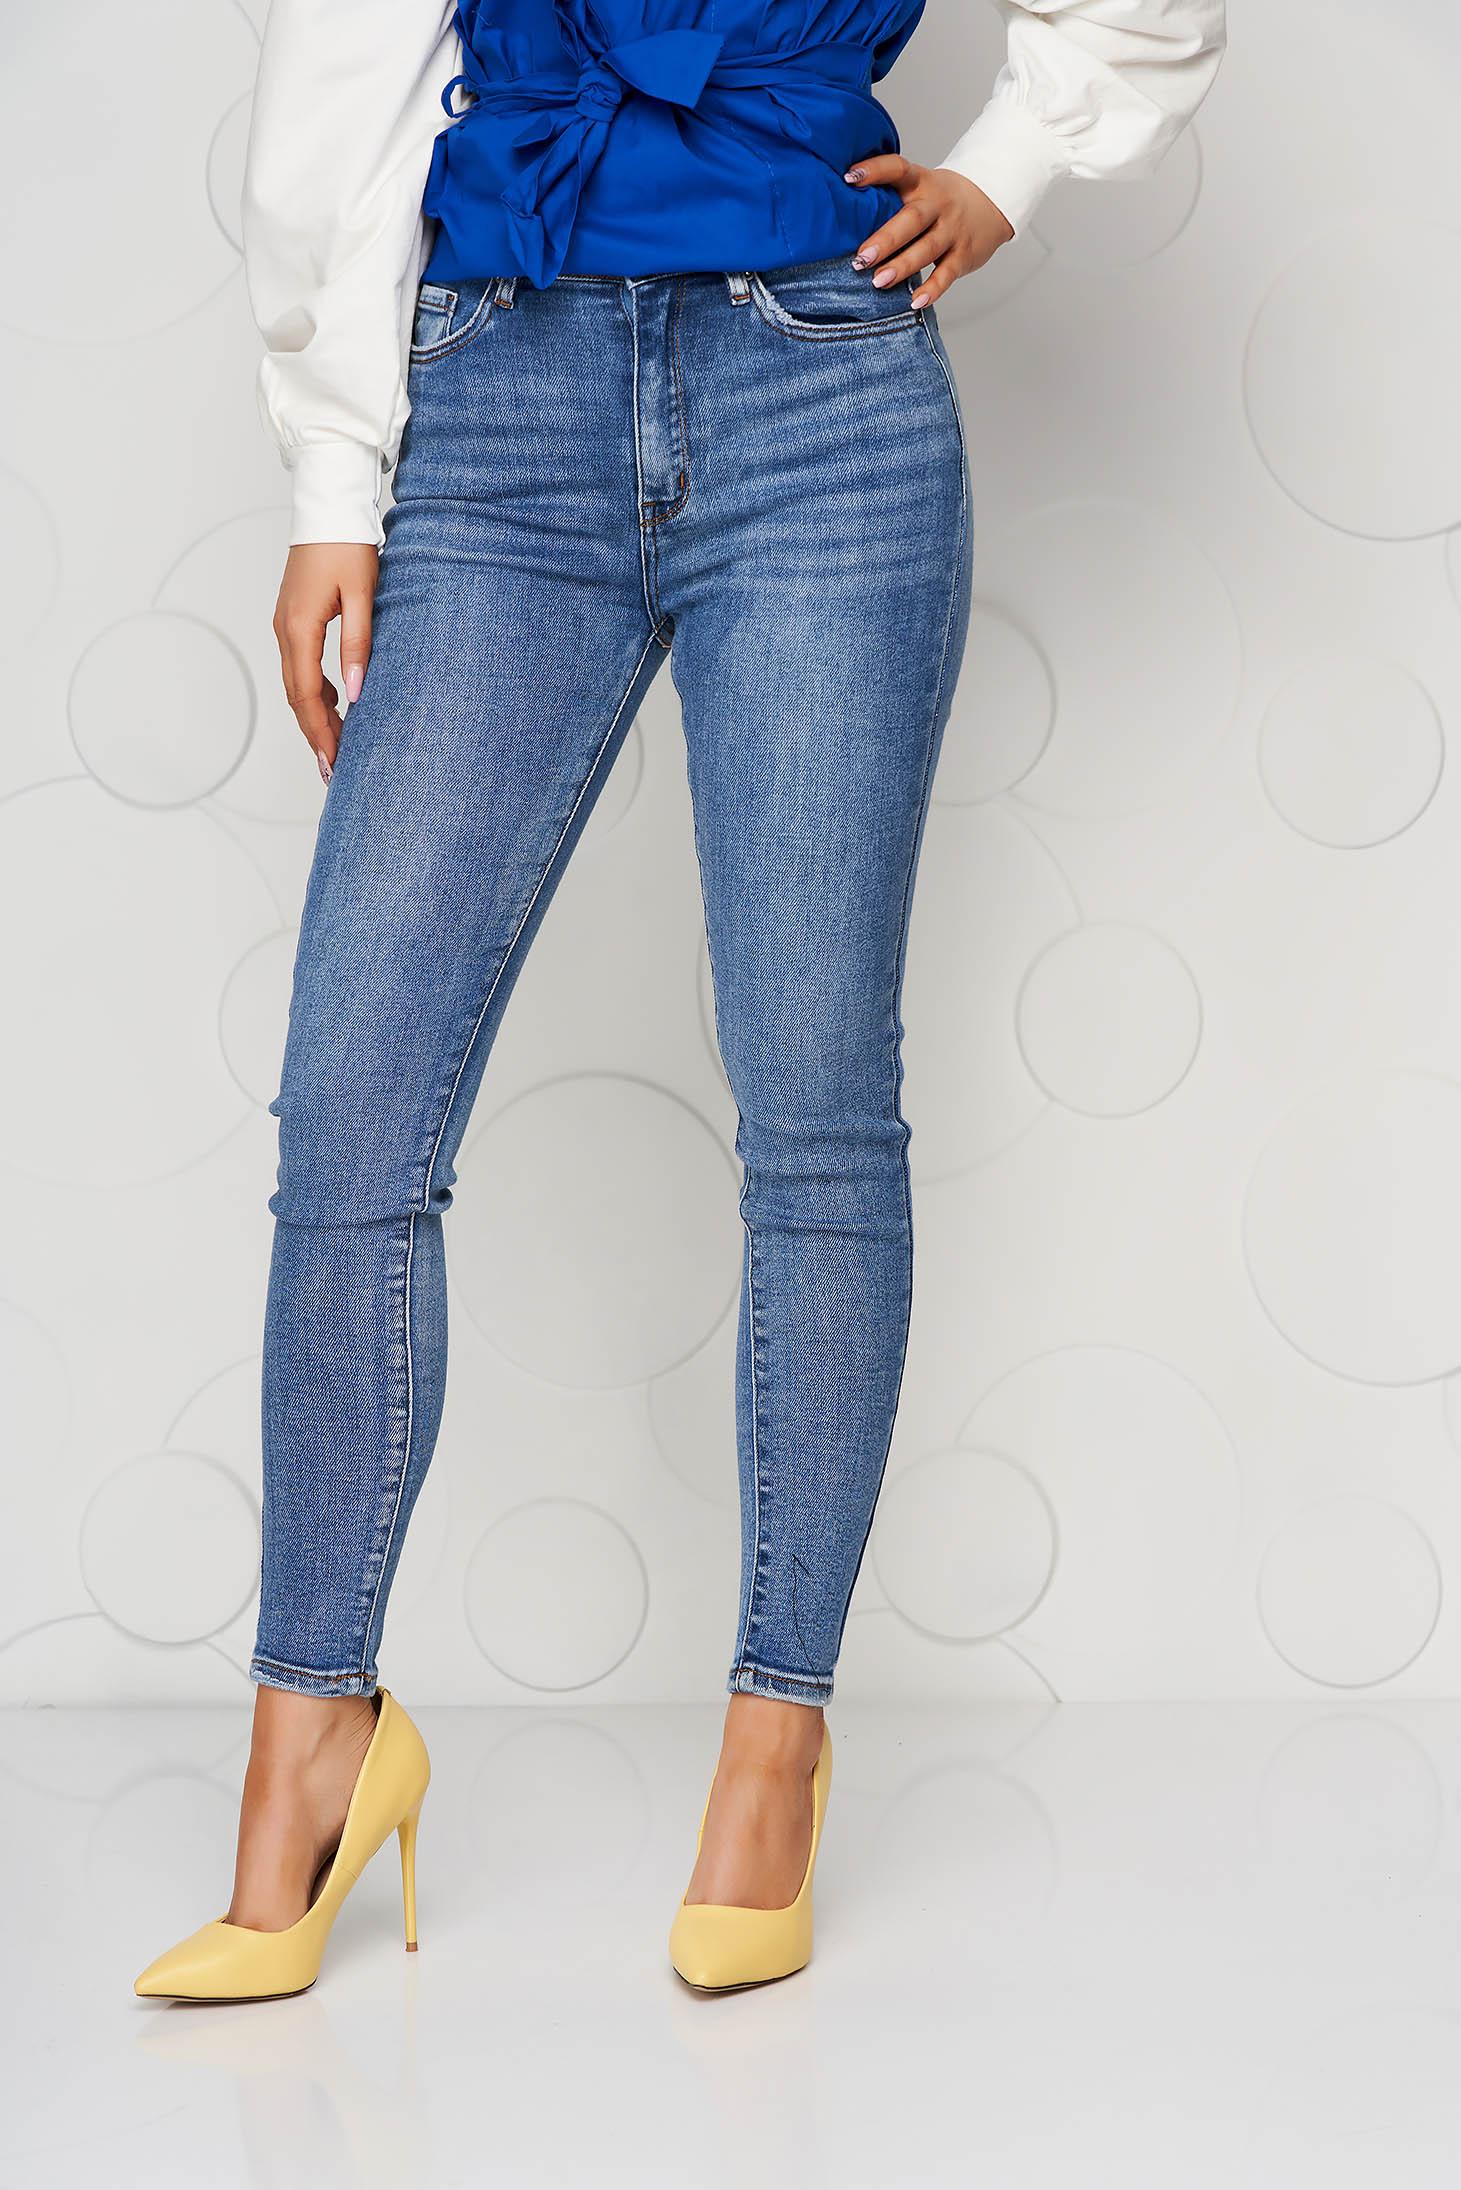 Blugi SunShine albastri vintage skinny elastici cu talie inalta